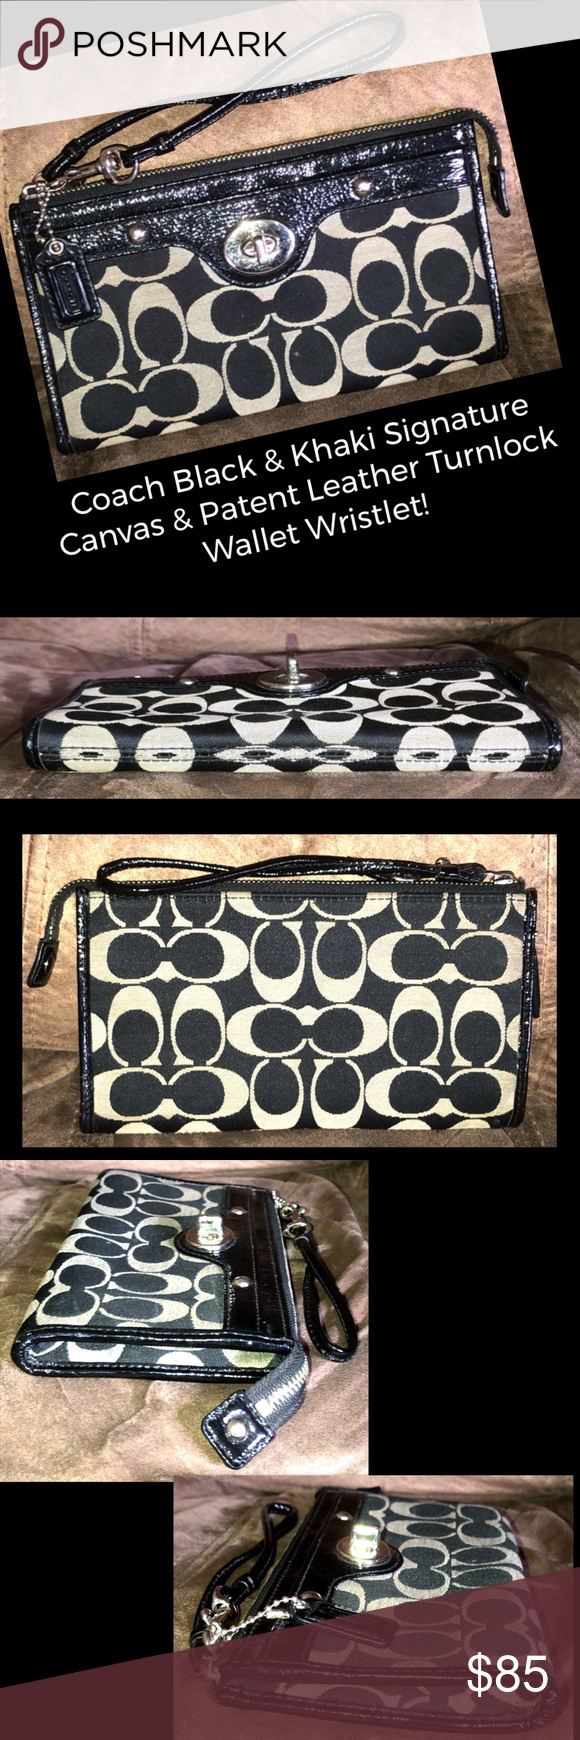 Coach Canvas & Leather Turnlock Wallet Wristlet! C